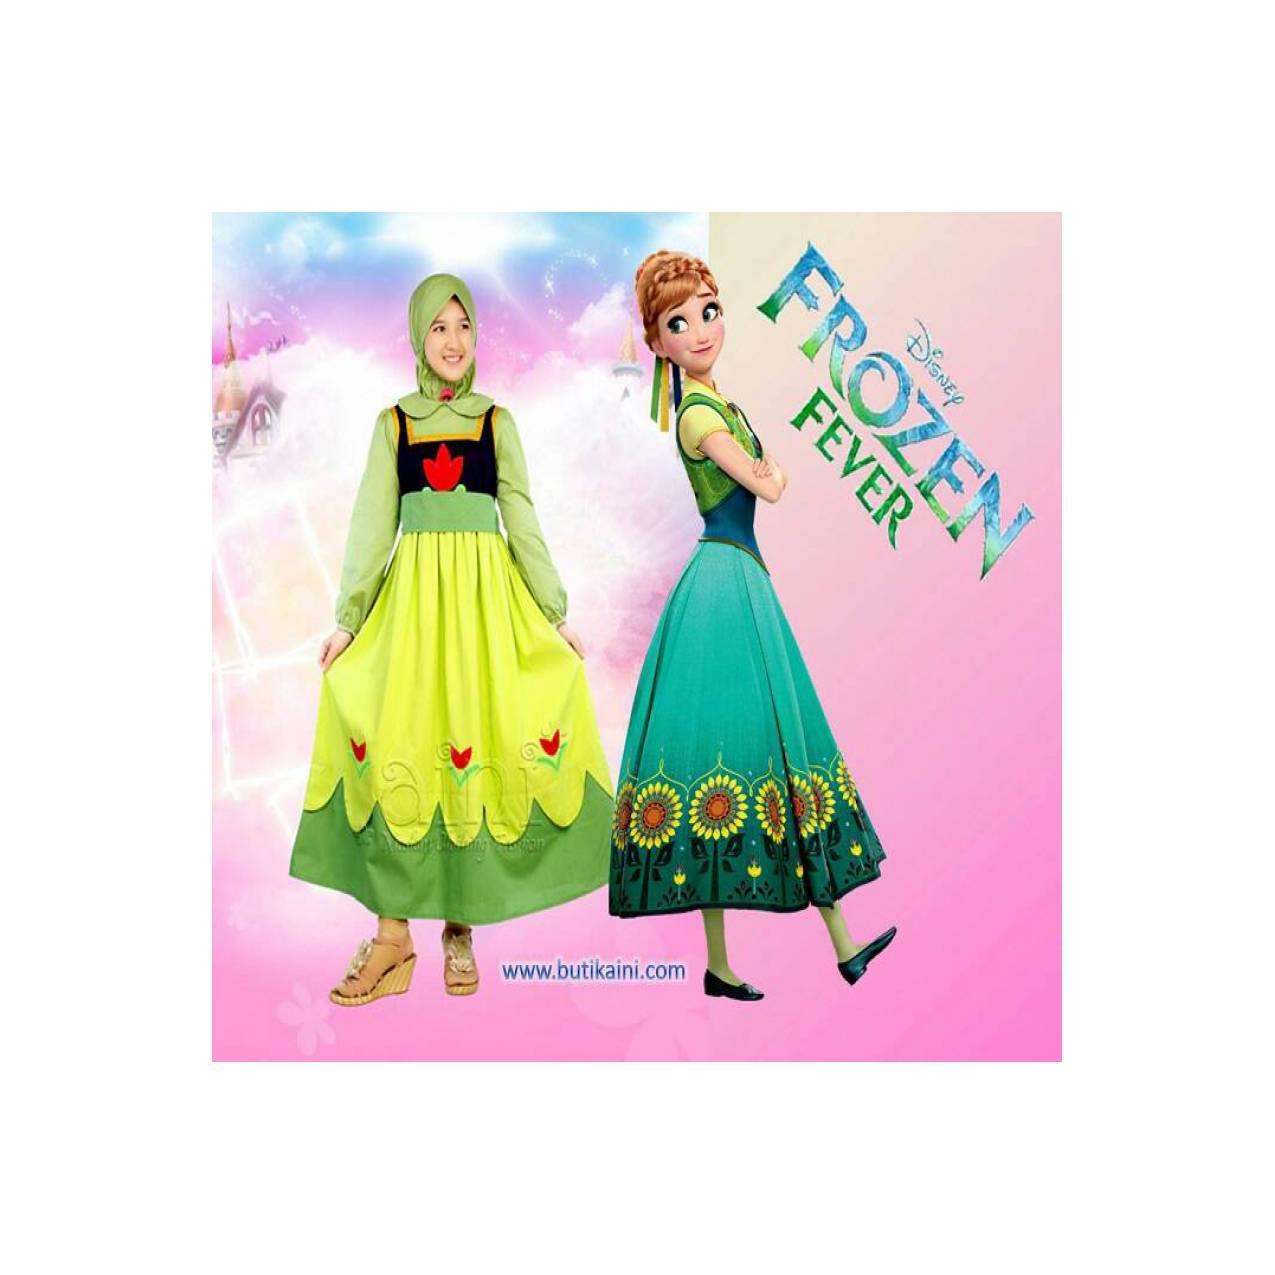 Set Busana Muslim Gamis Anak Aini 160203 Model Young Anna Frozen Kid